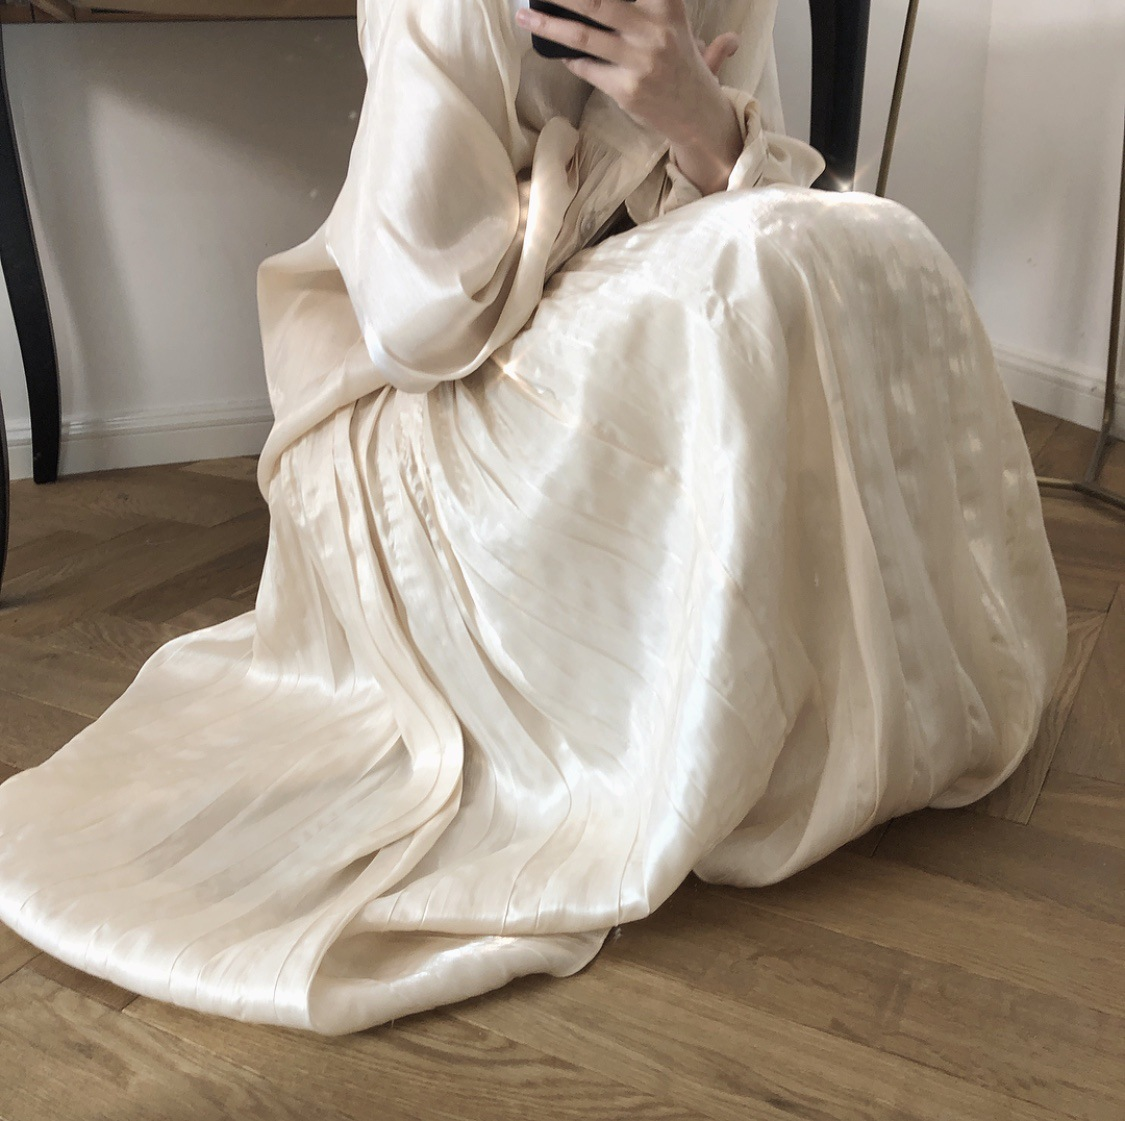 2019 Women Summer Long Skirt Chic Brand Women Satin Pleated Skirts High Waist Women Wrinkled Skirts Faldas Saias Jupe